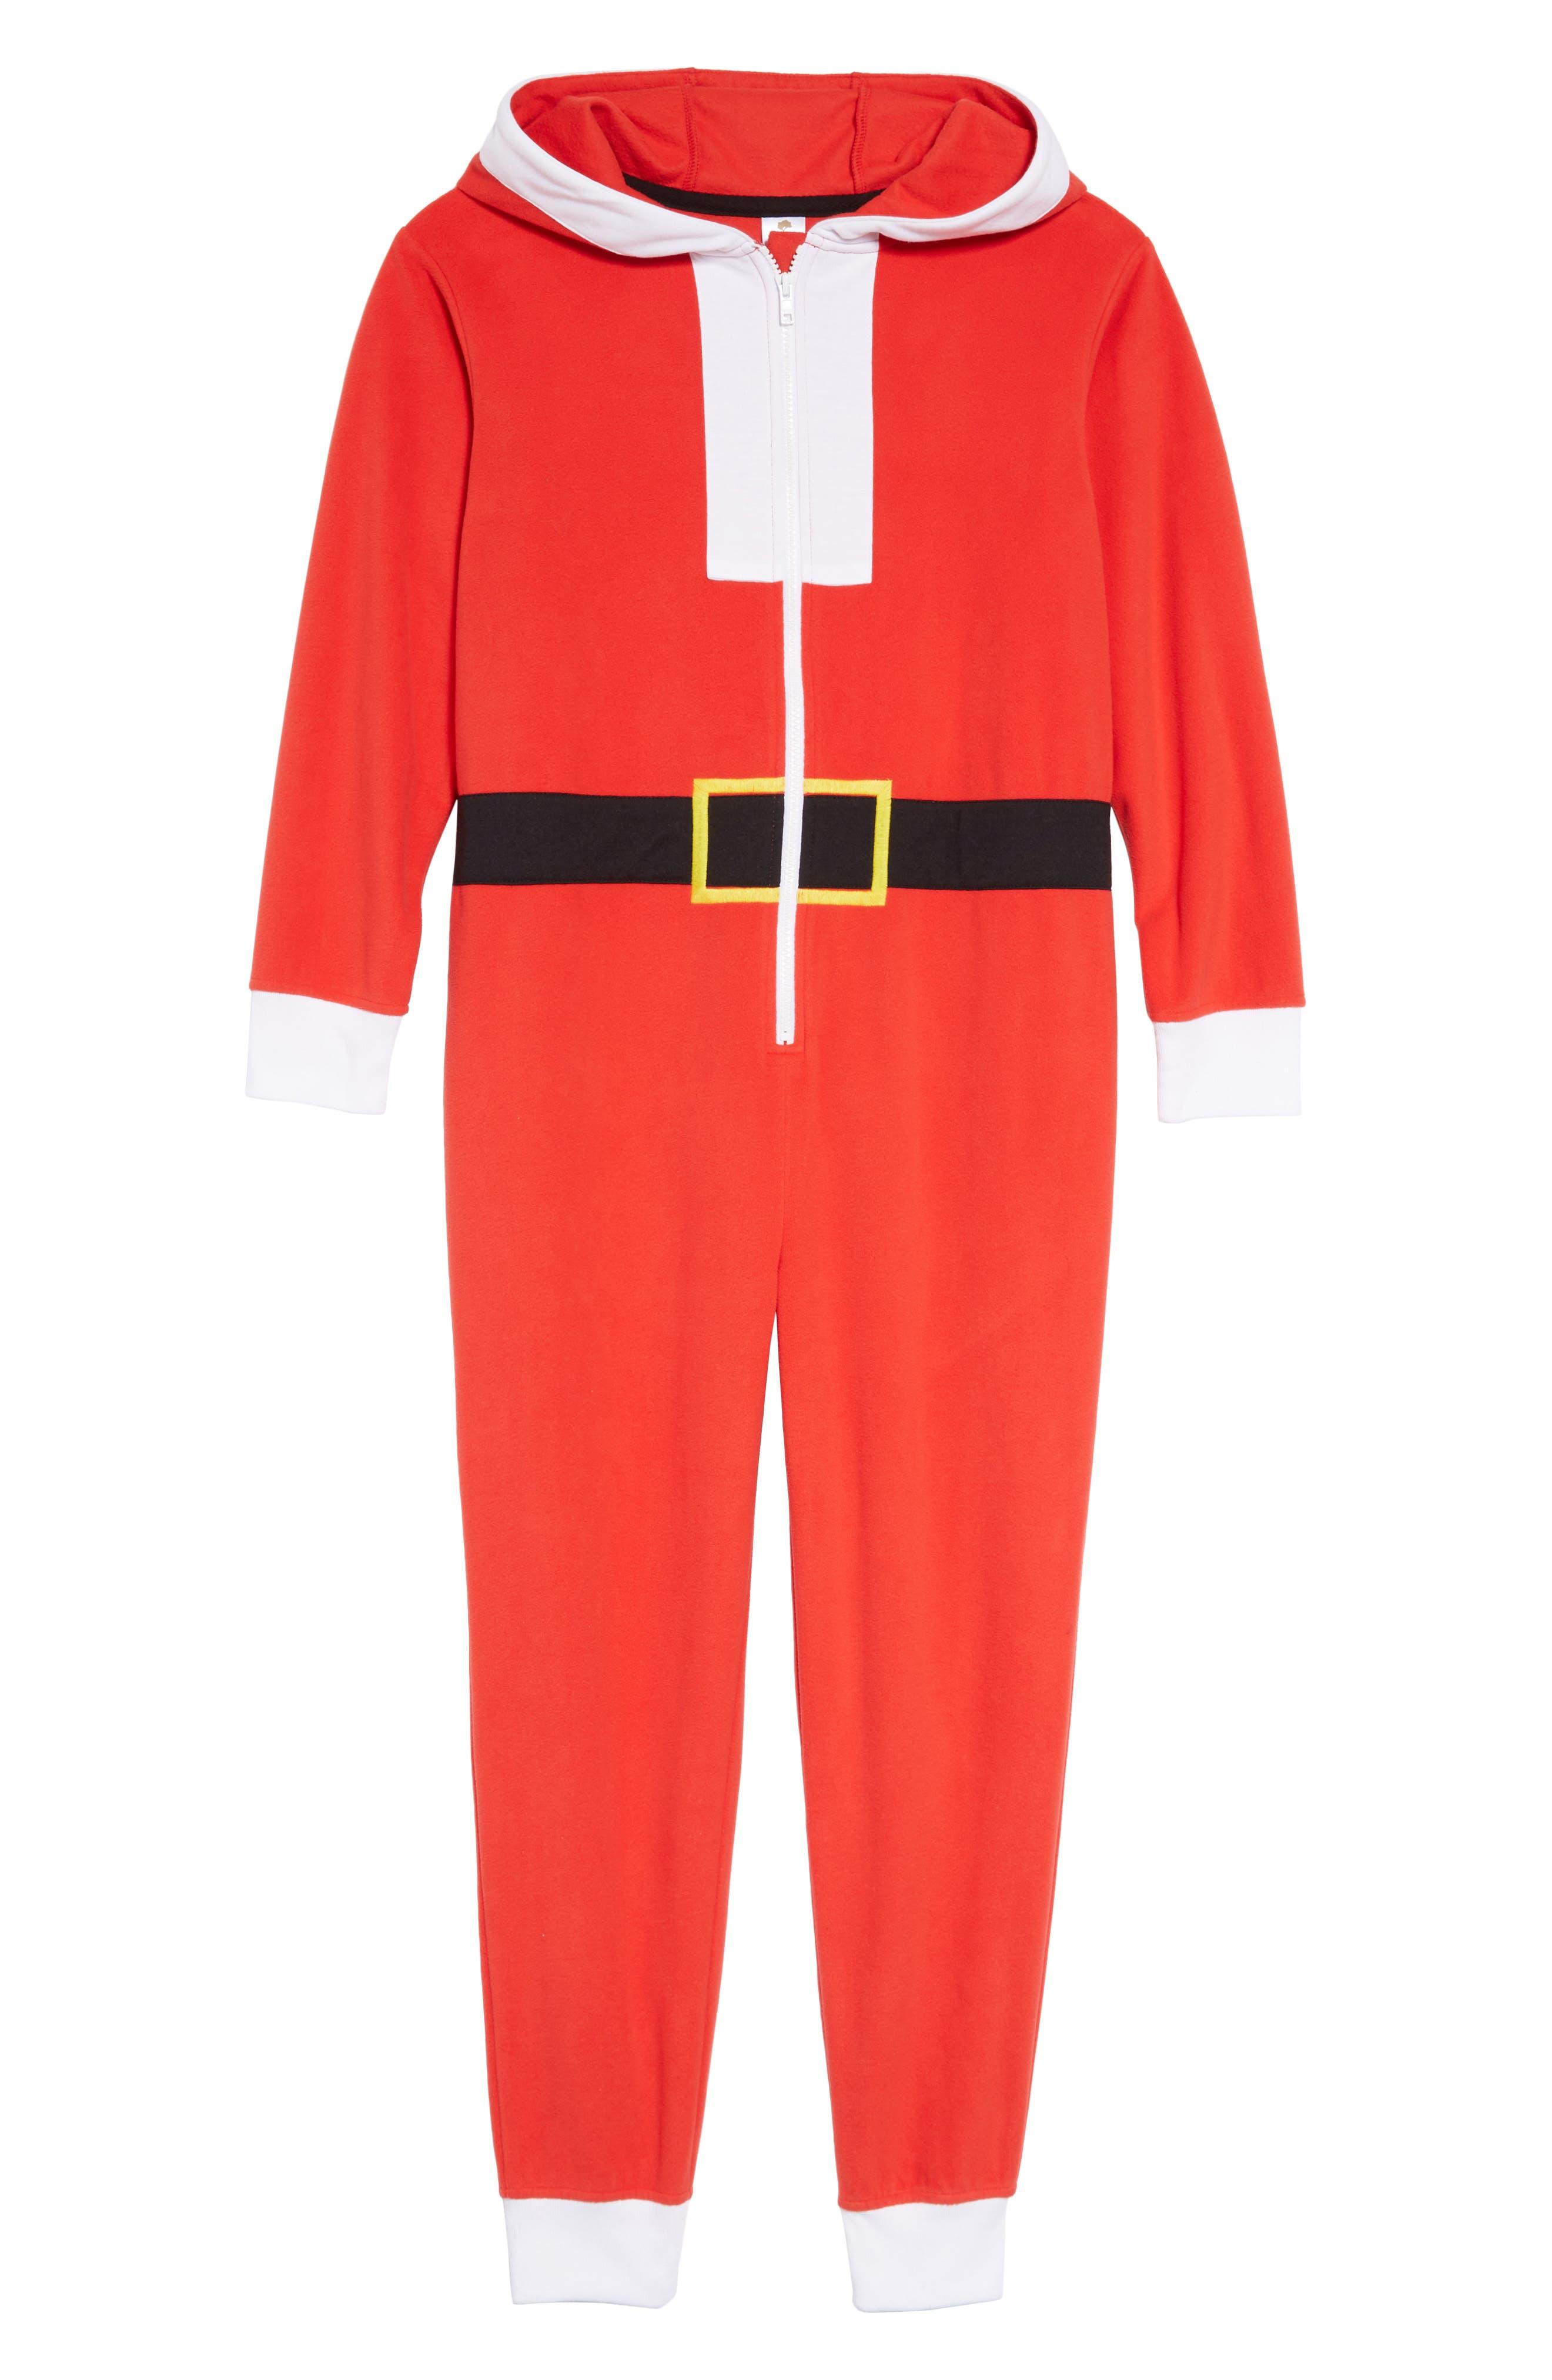 Santa Hooded One-Piece Pajamas,                             Main thumbnail 1, color,                             RED BLOOM SANTA SUIT